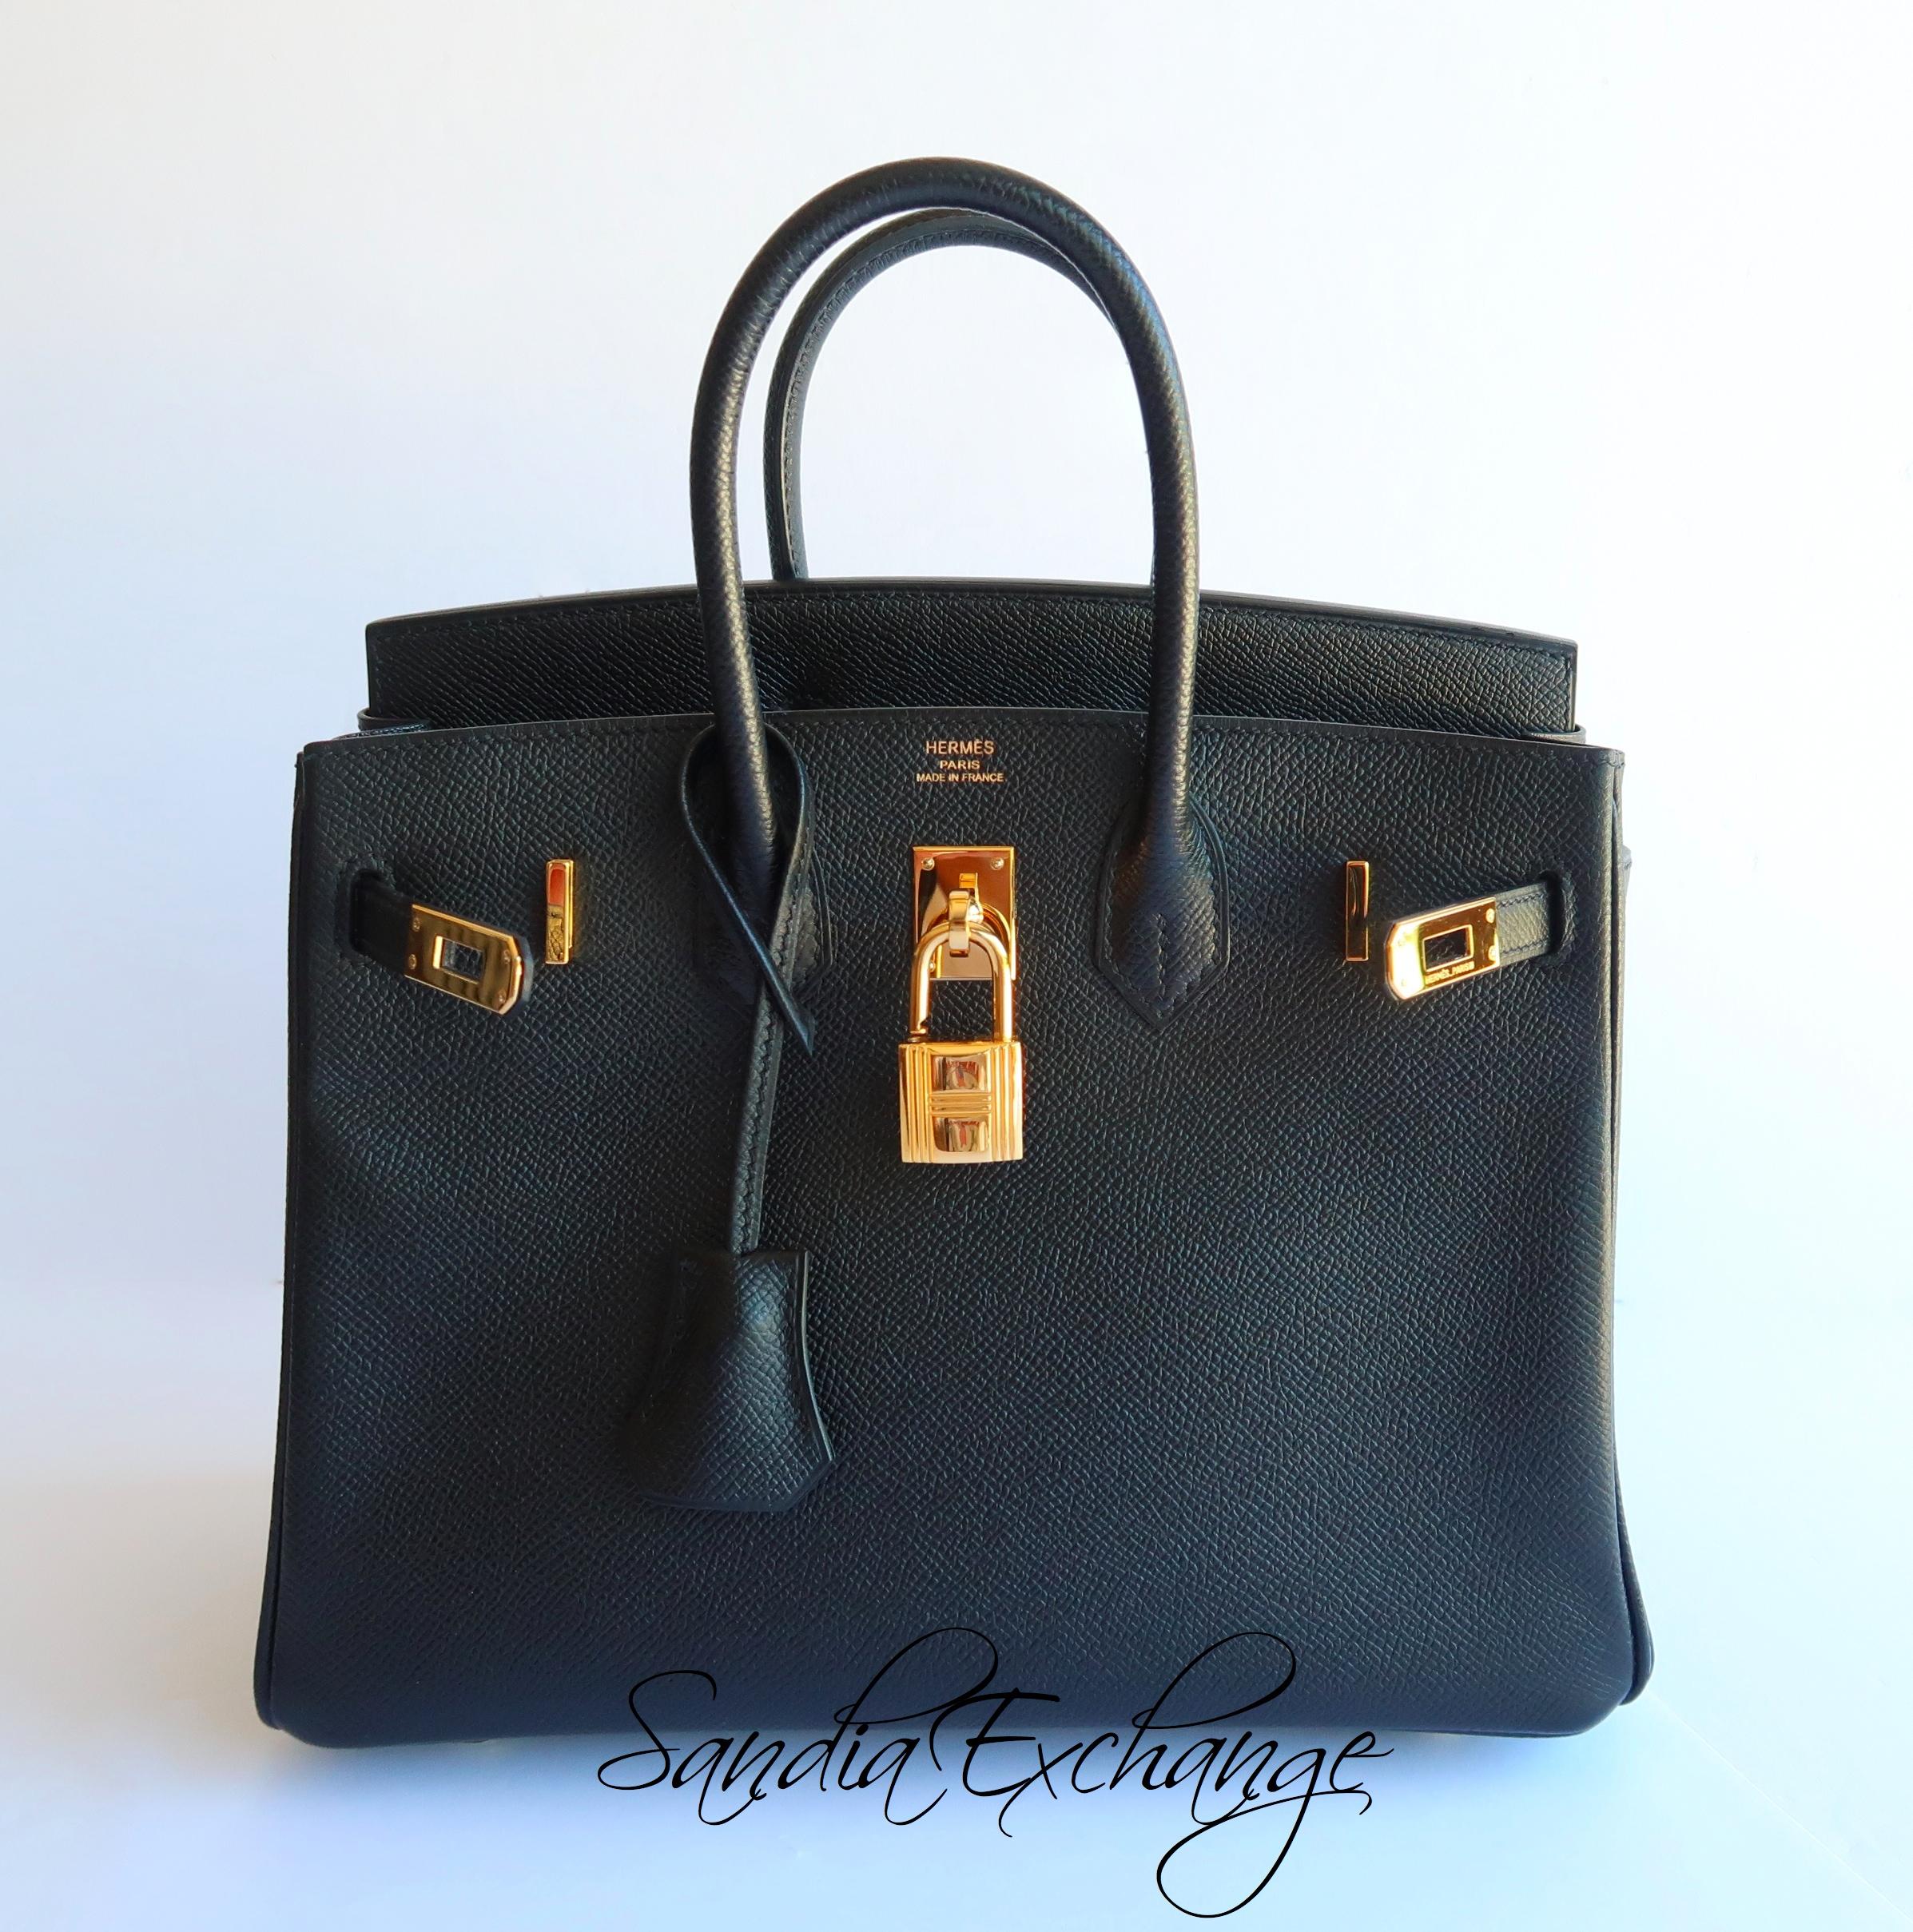 0a569bda1678 HERMES Birkin 25 cm Black Noir Epsom Gold Hardware RARE! Authentic ...